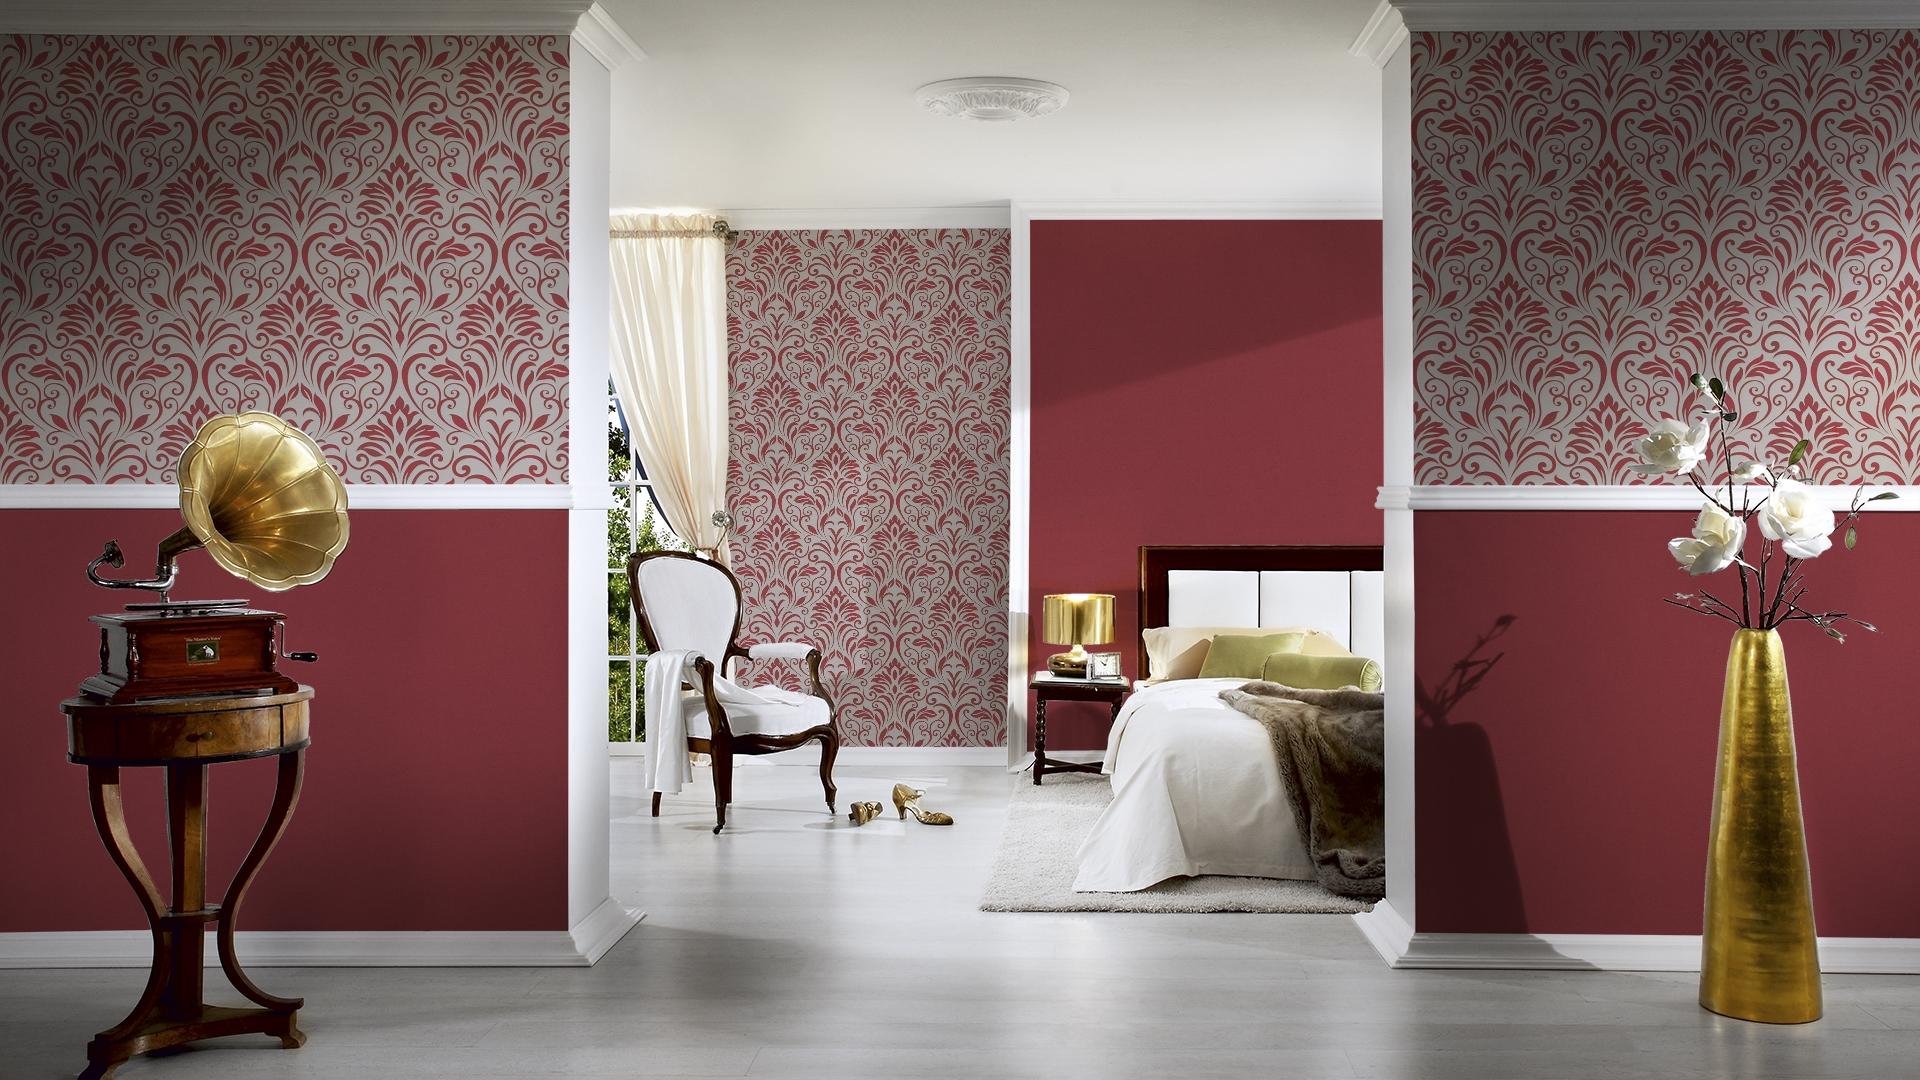 livingwalls uni tapete moments vlies rot mit struktur 328358. Black Bedroom Furniture Sets. Home Design Ideas